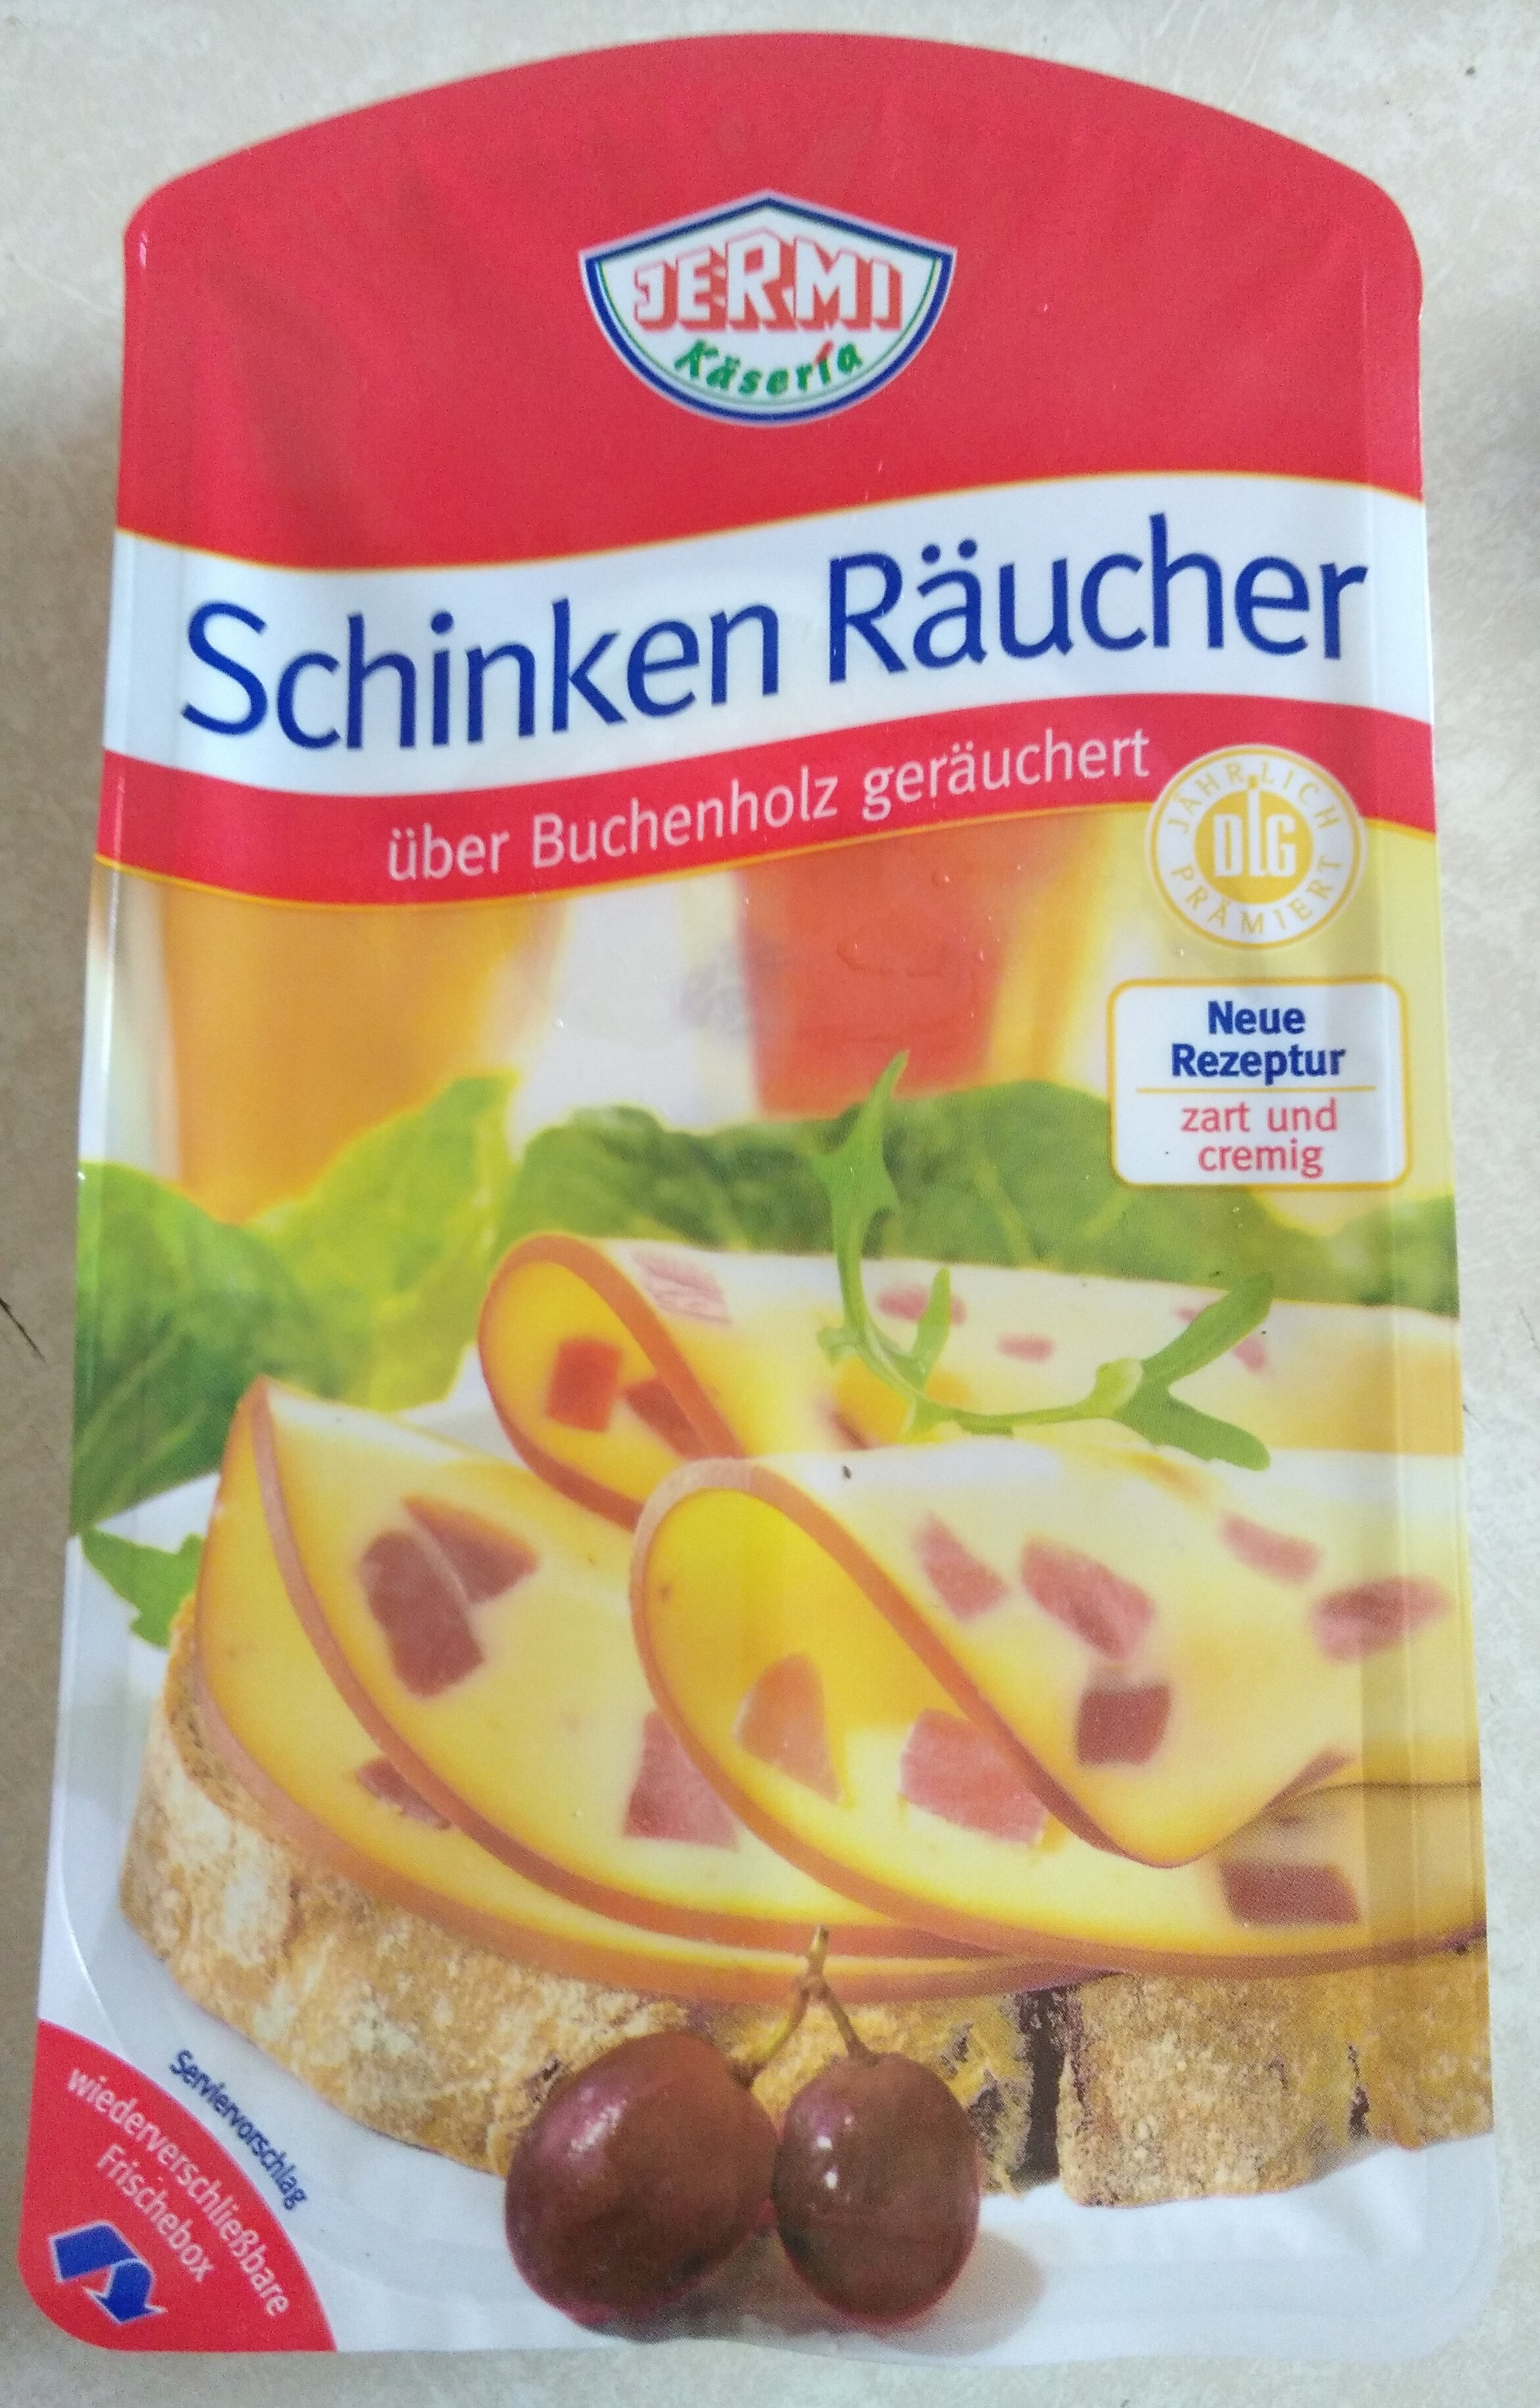 Schinken Räucher - Product